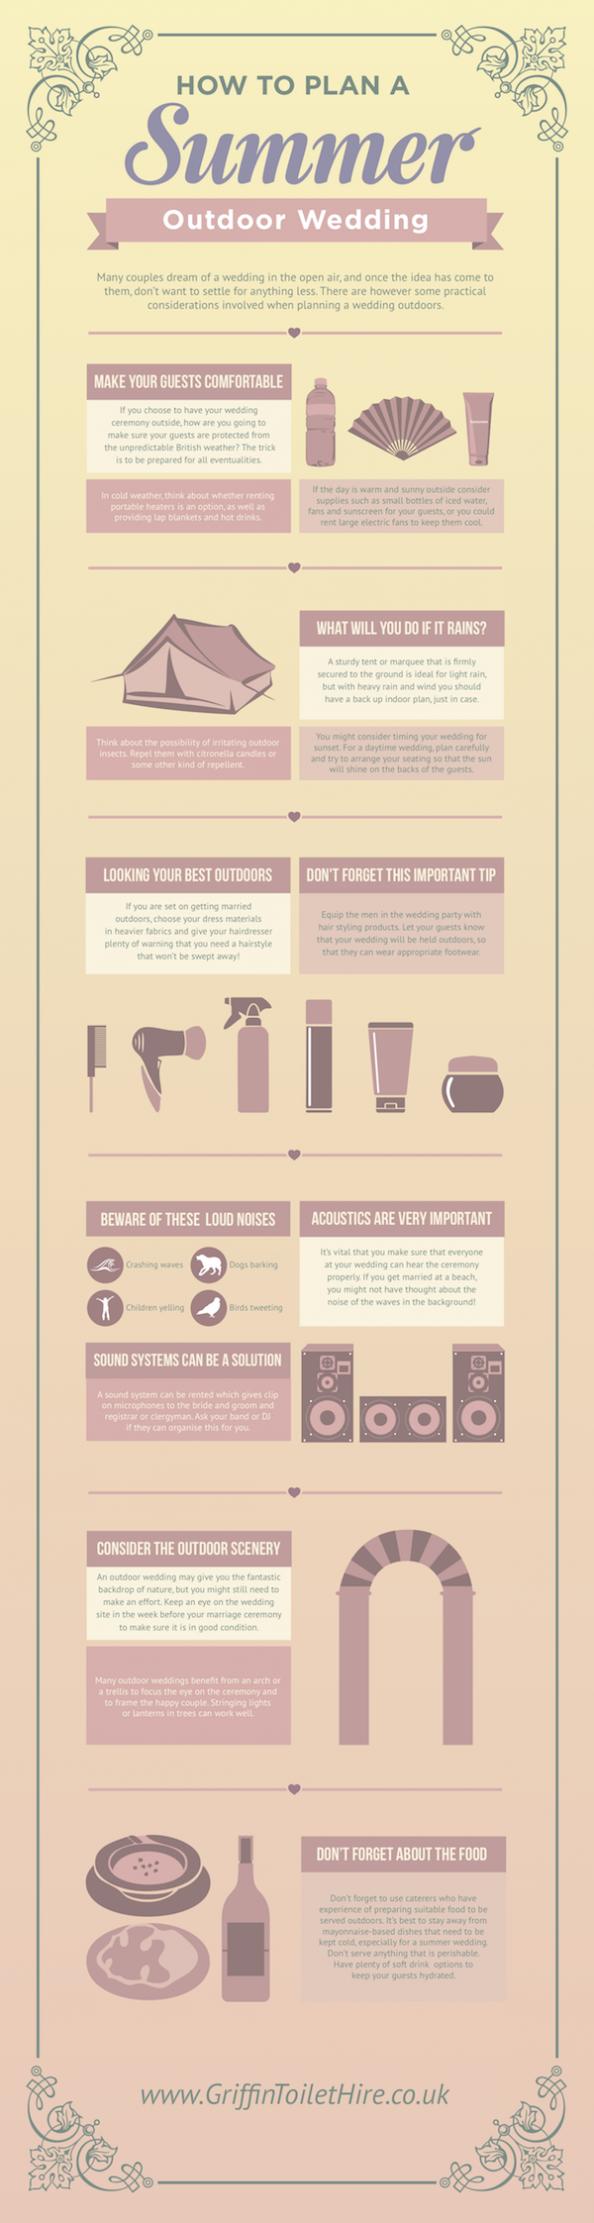 wedding planning infographic